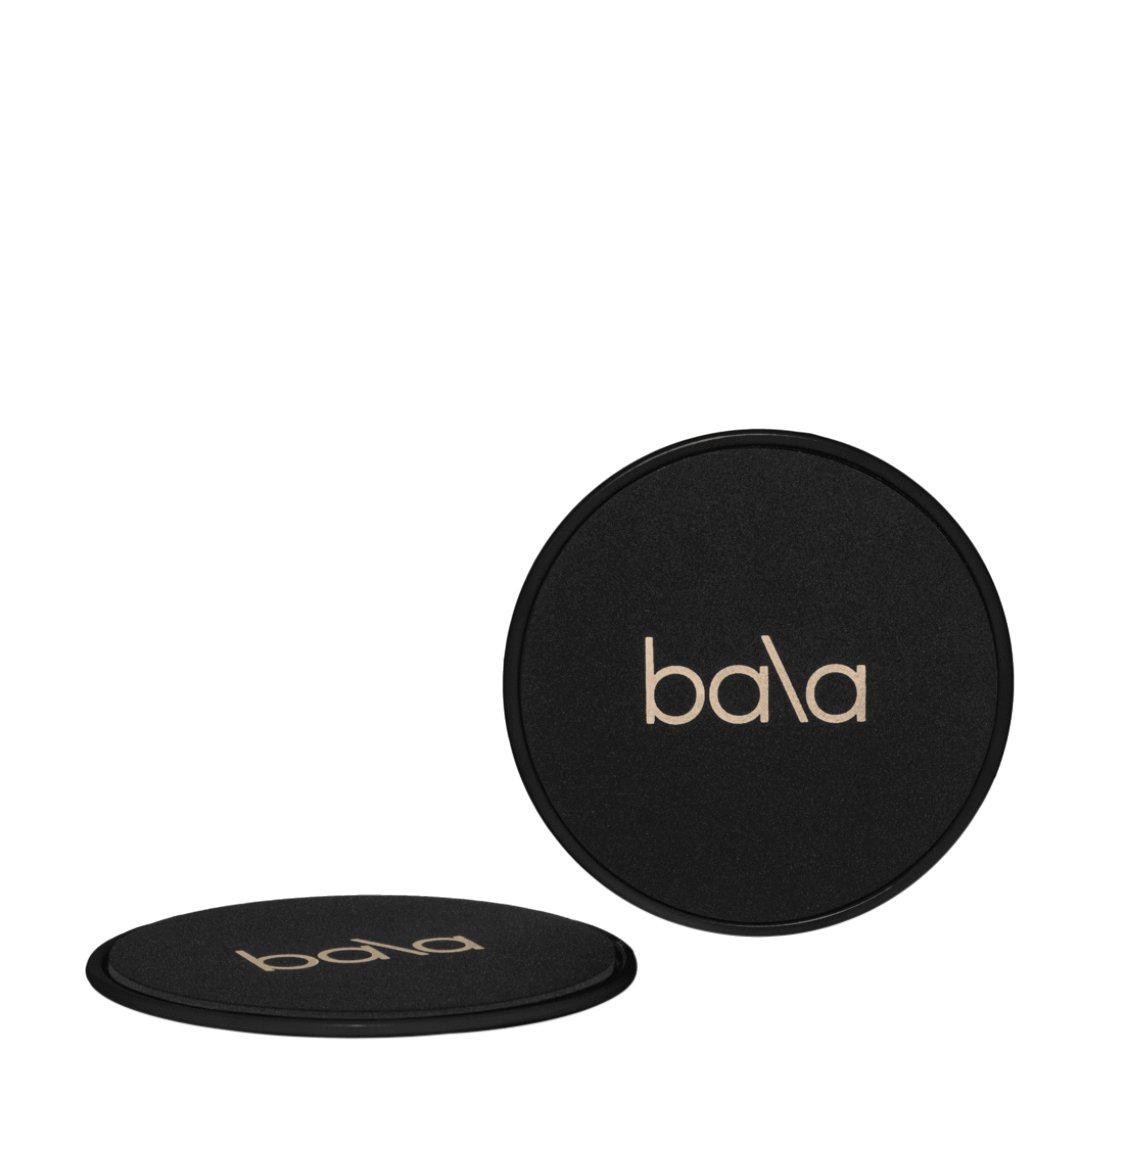 Bala Sliders Δίσκοι Ολίσθησης Σετ 2 Τεμαχίων